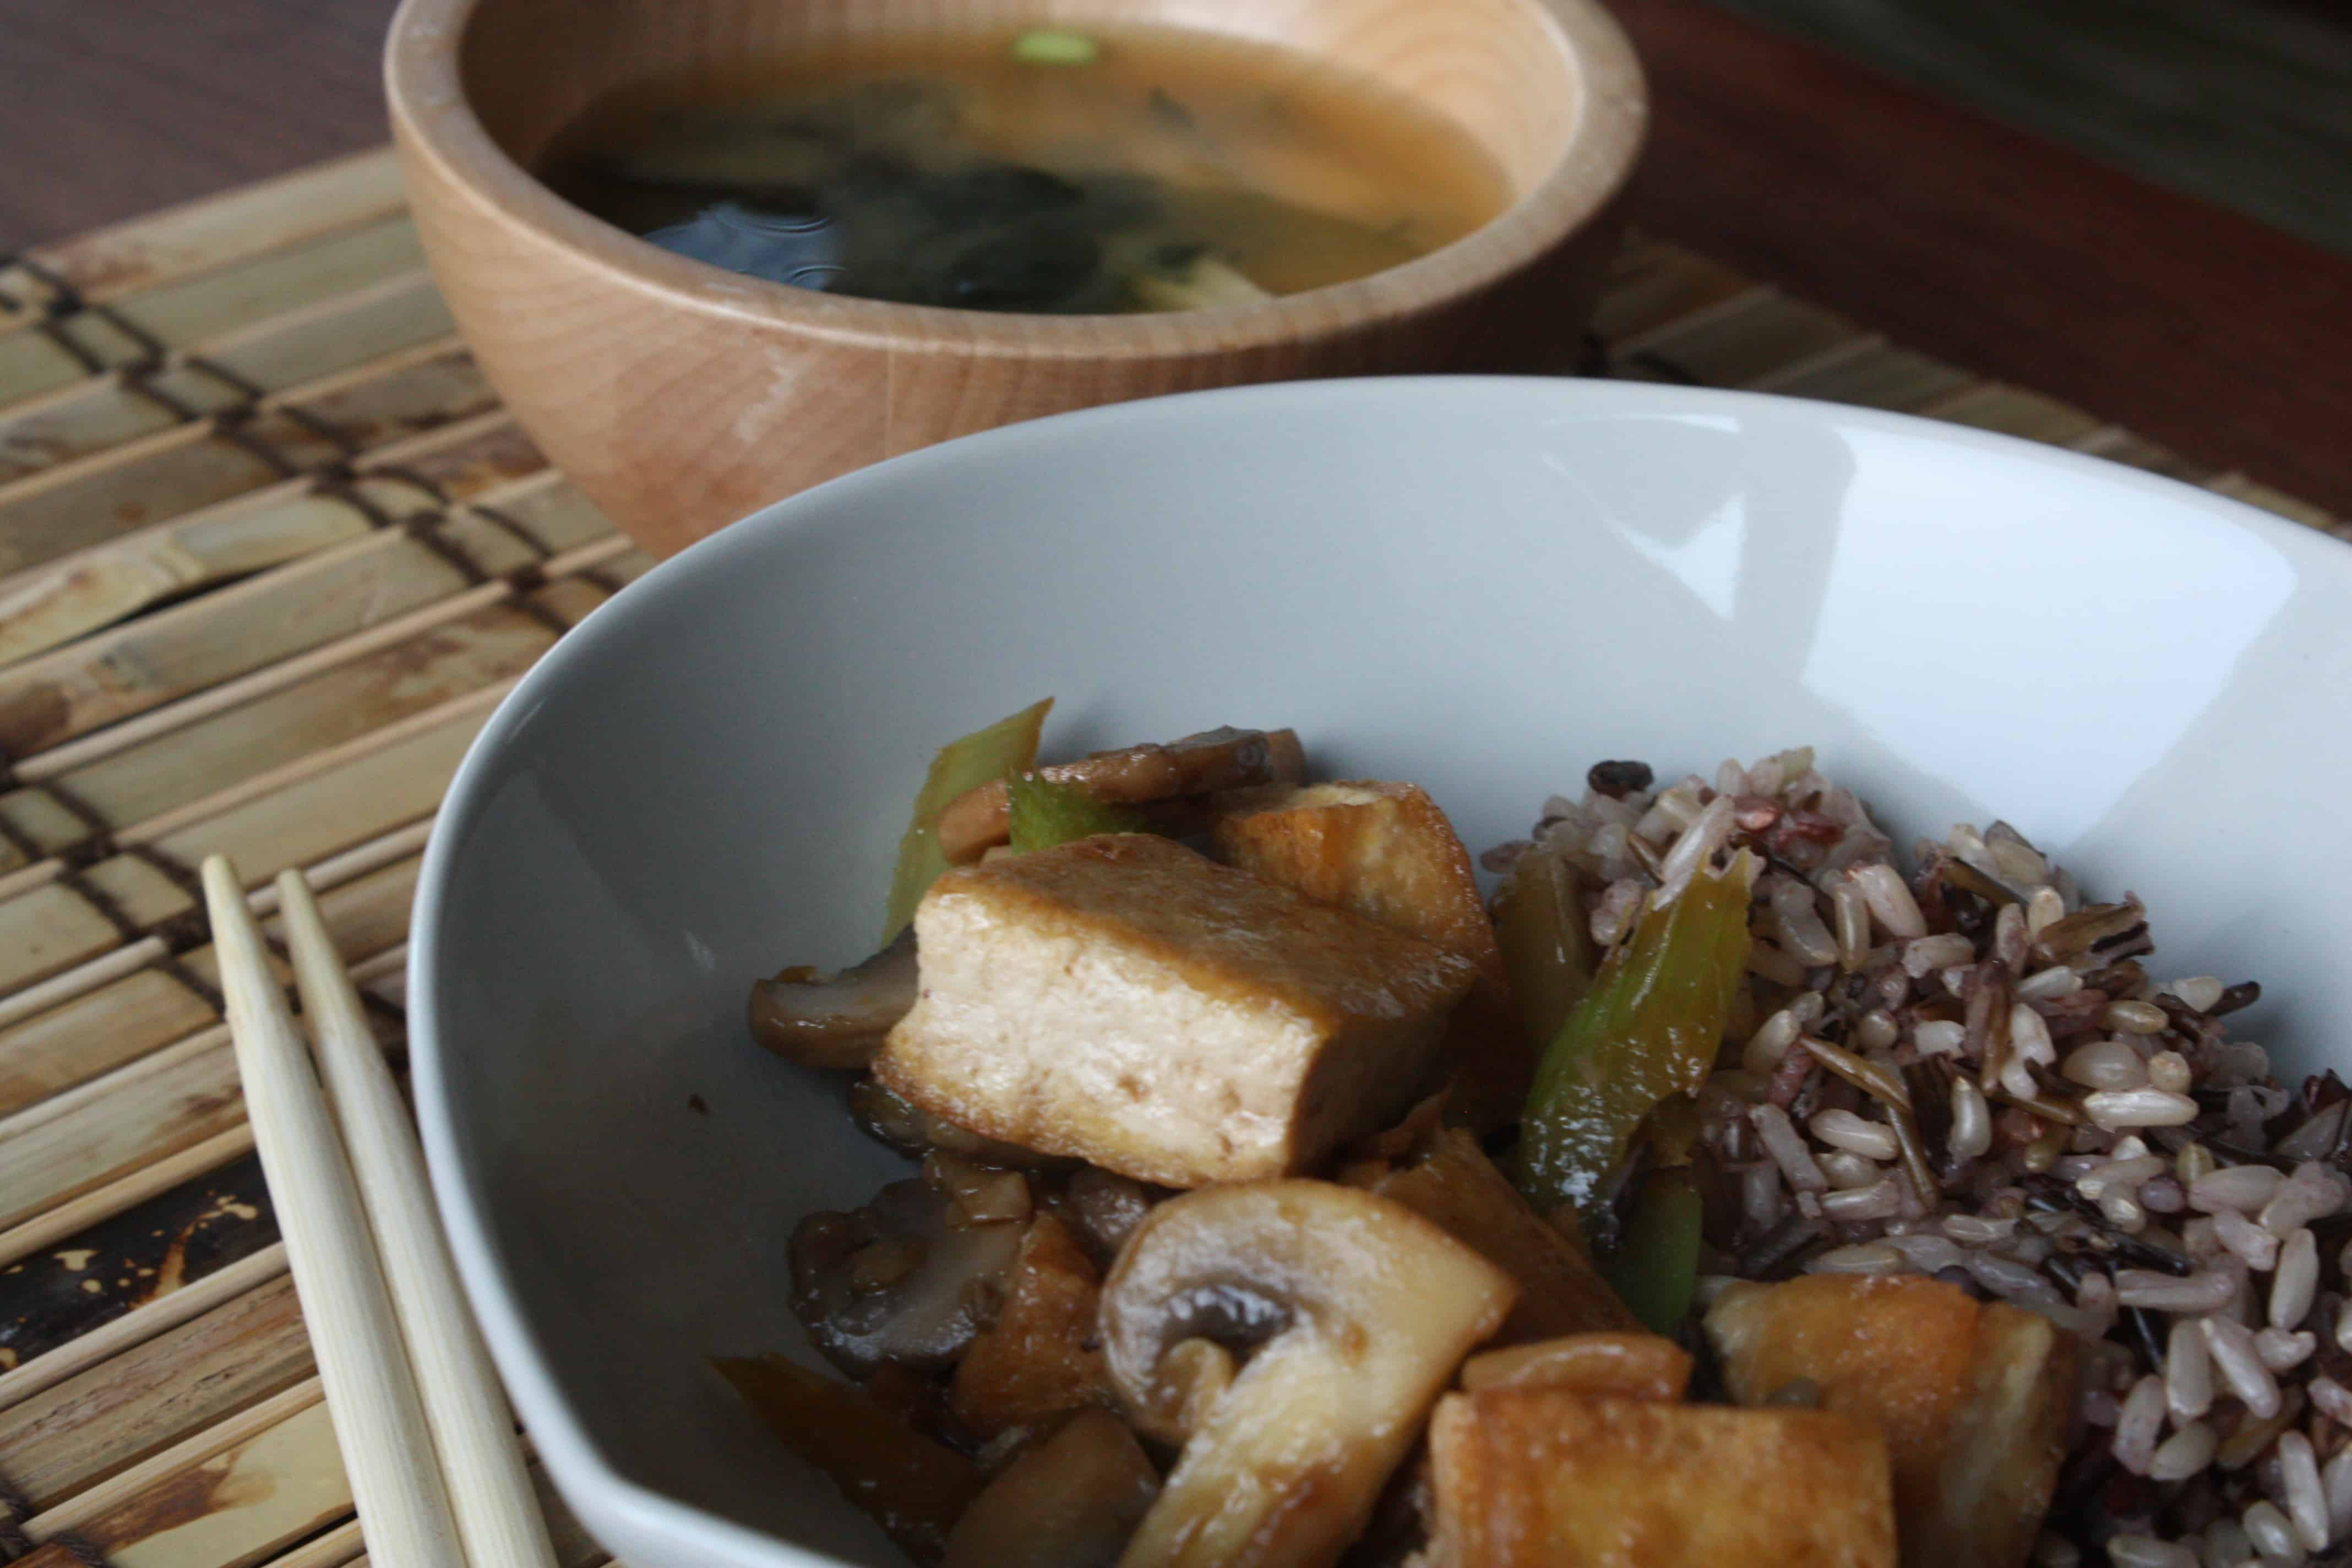 Stir-fried tofu with mushrooms and celery